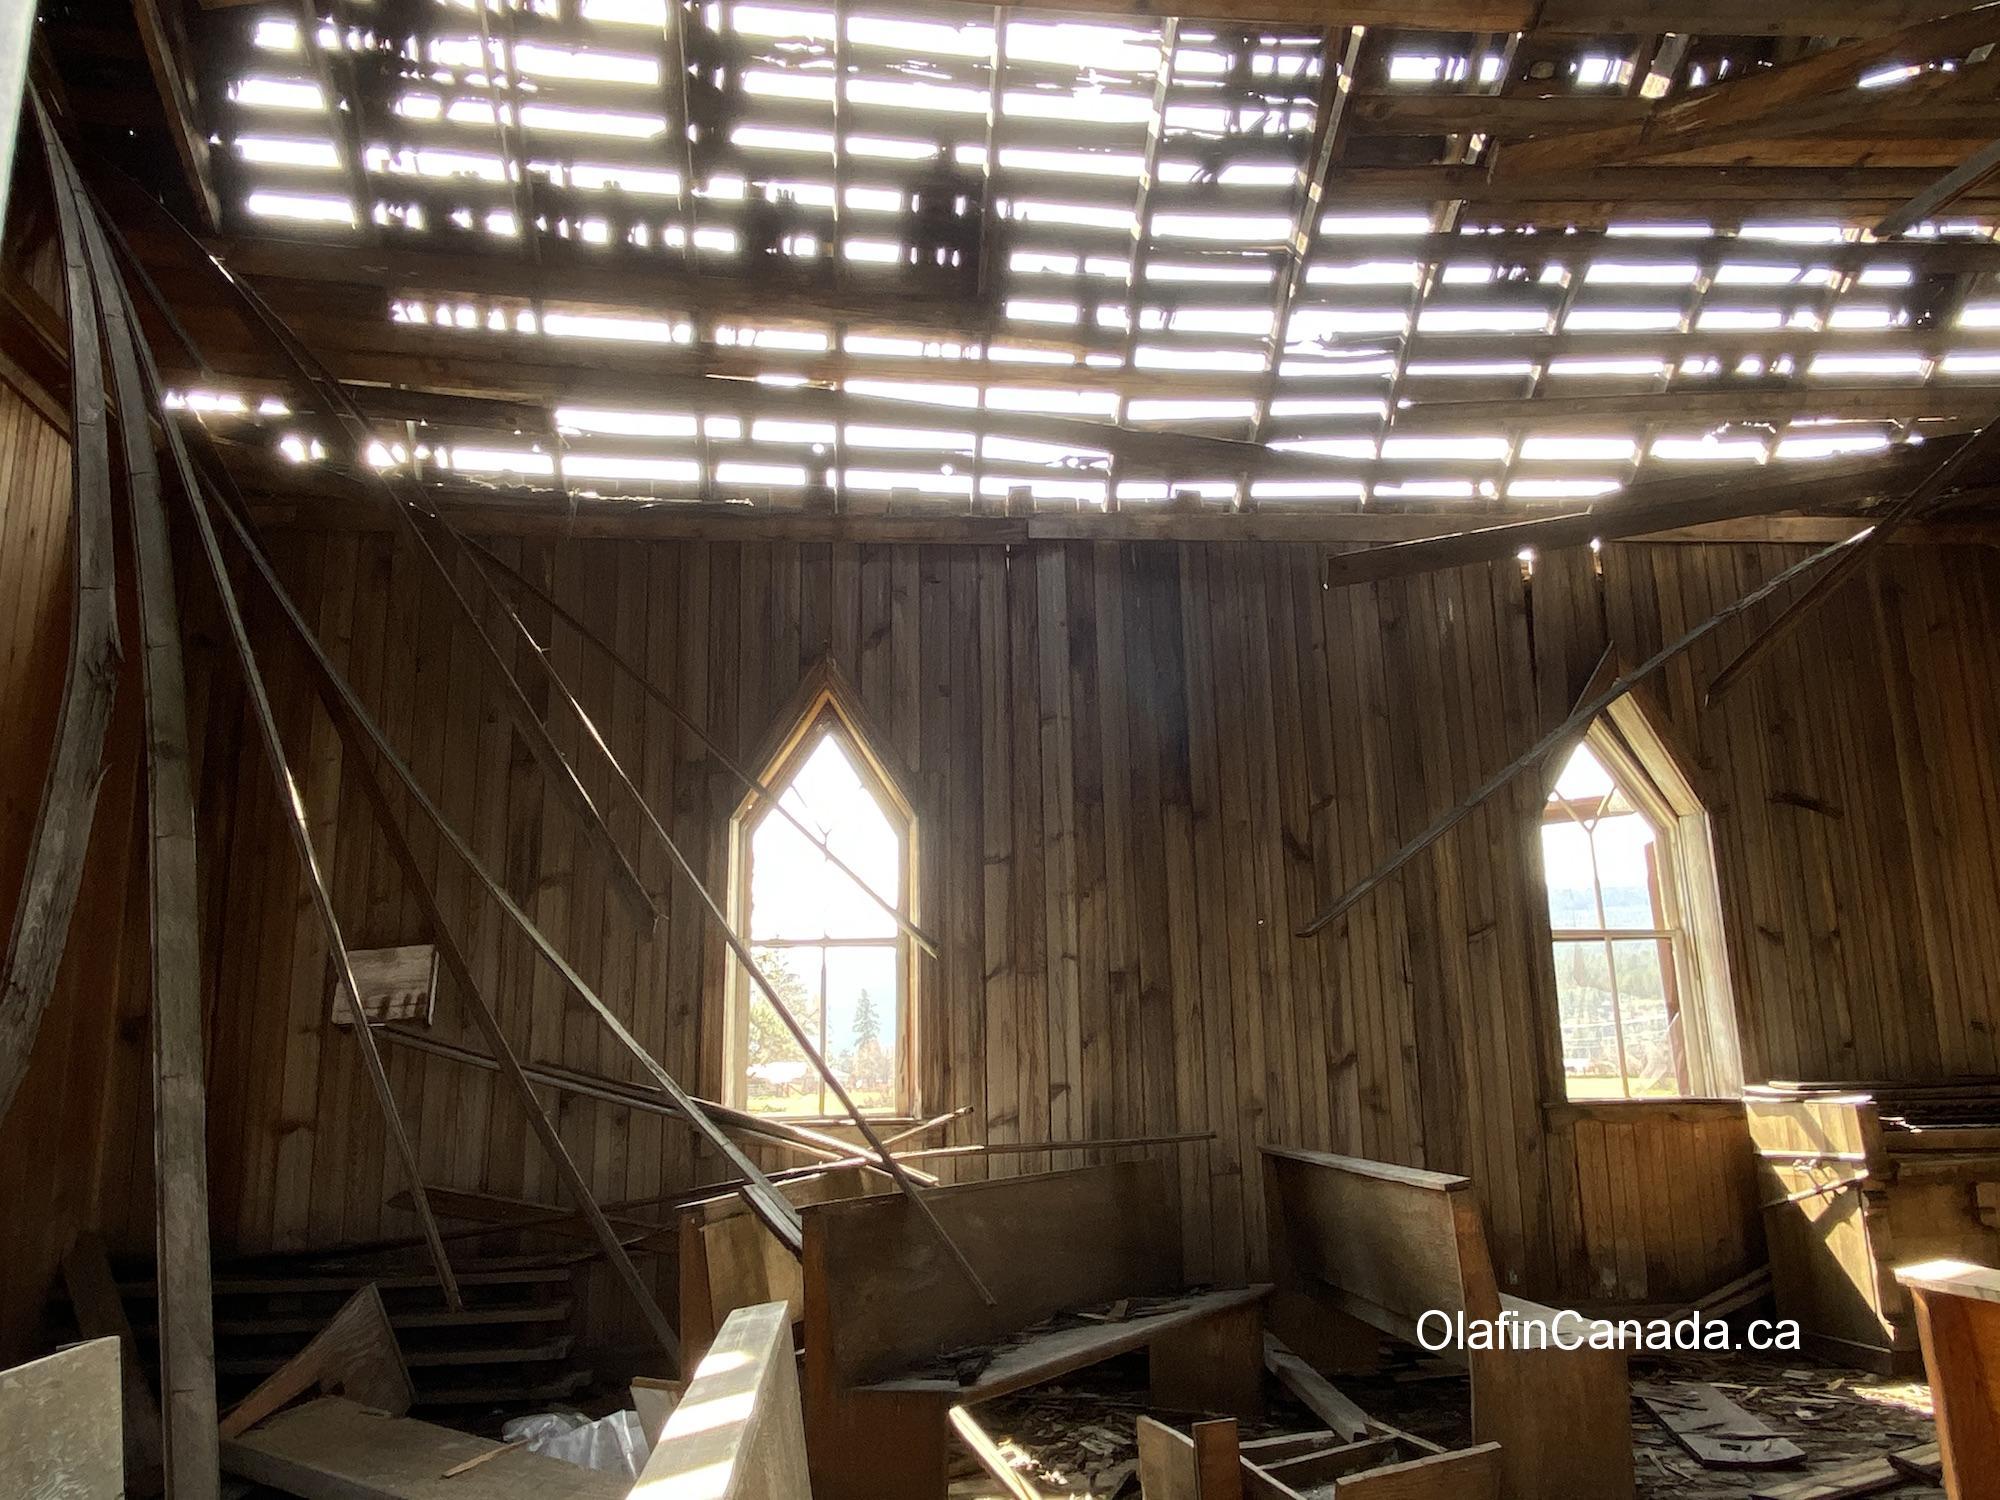 Abandoned church on the Westside Road in West Kelowna #olafincanada #britishcolumbia #discoverbc #abandonedbc #church